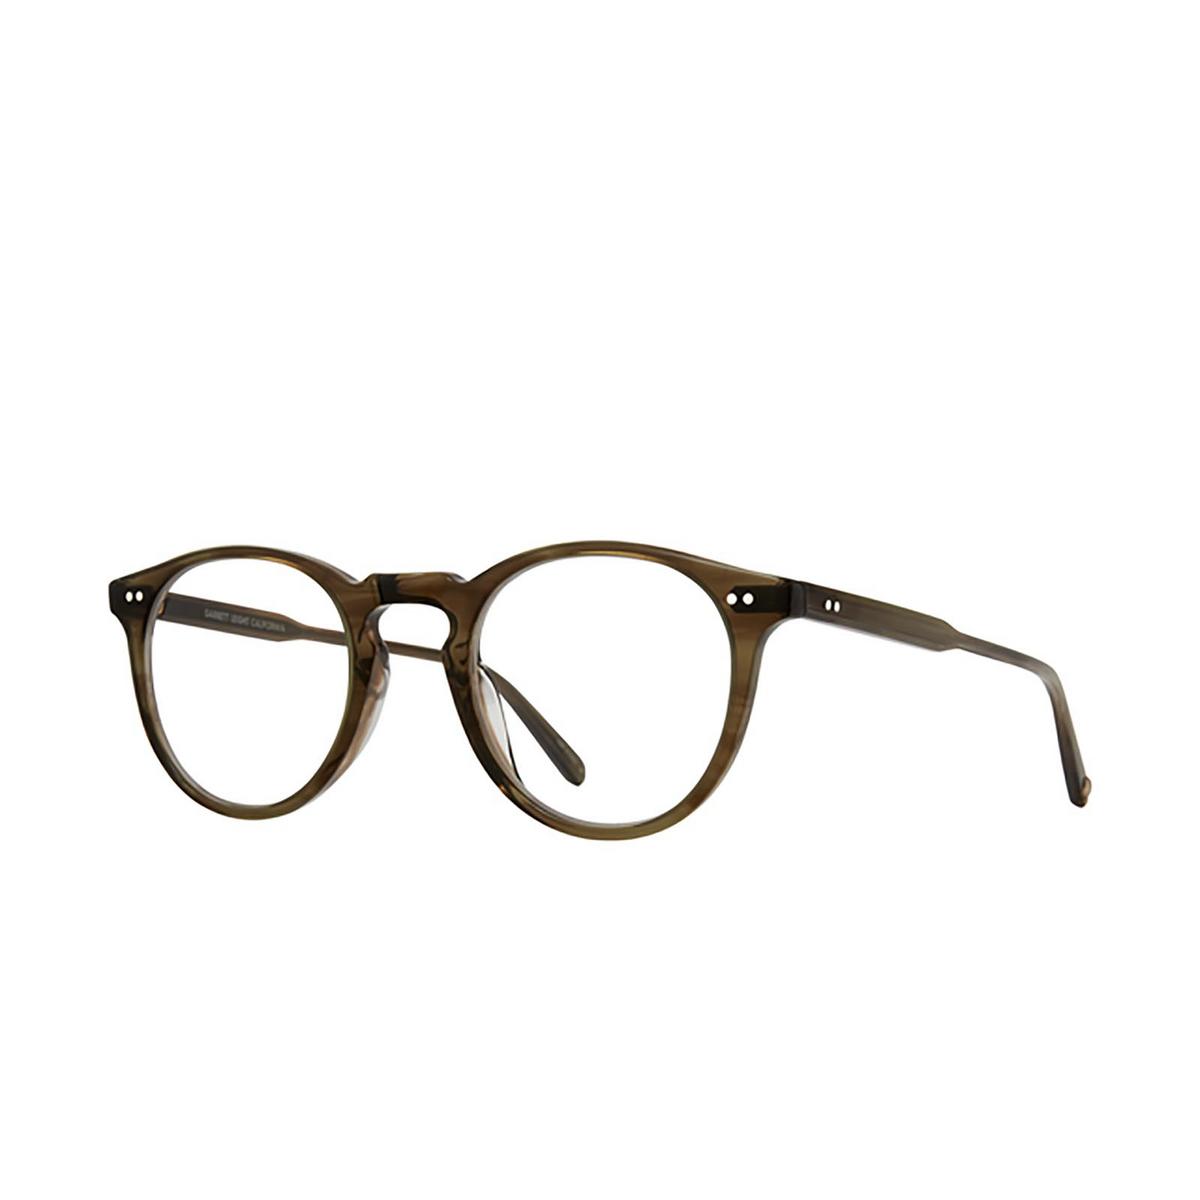 Garrett Leight® Round Eyeglasses: Glencoe color Olive Tortoise Ot - three-quarters view.